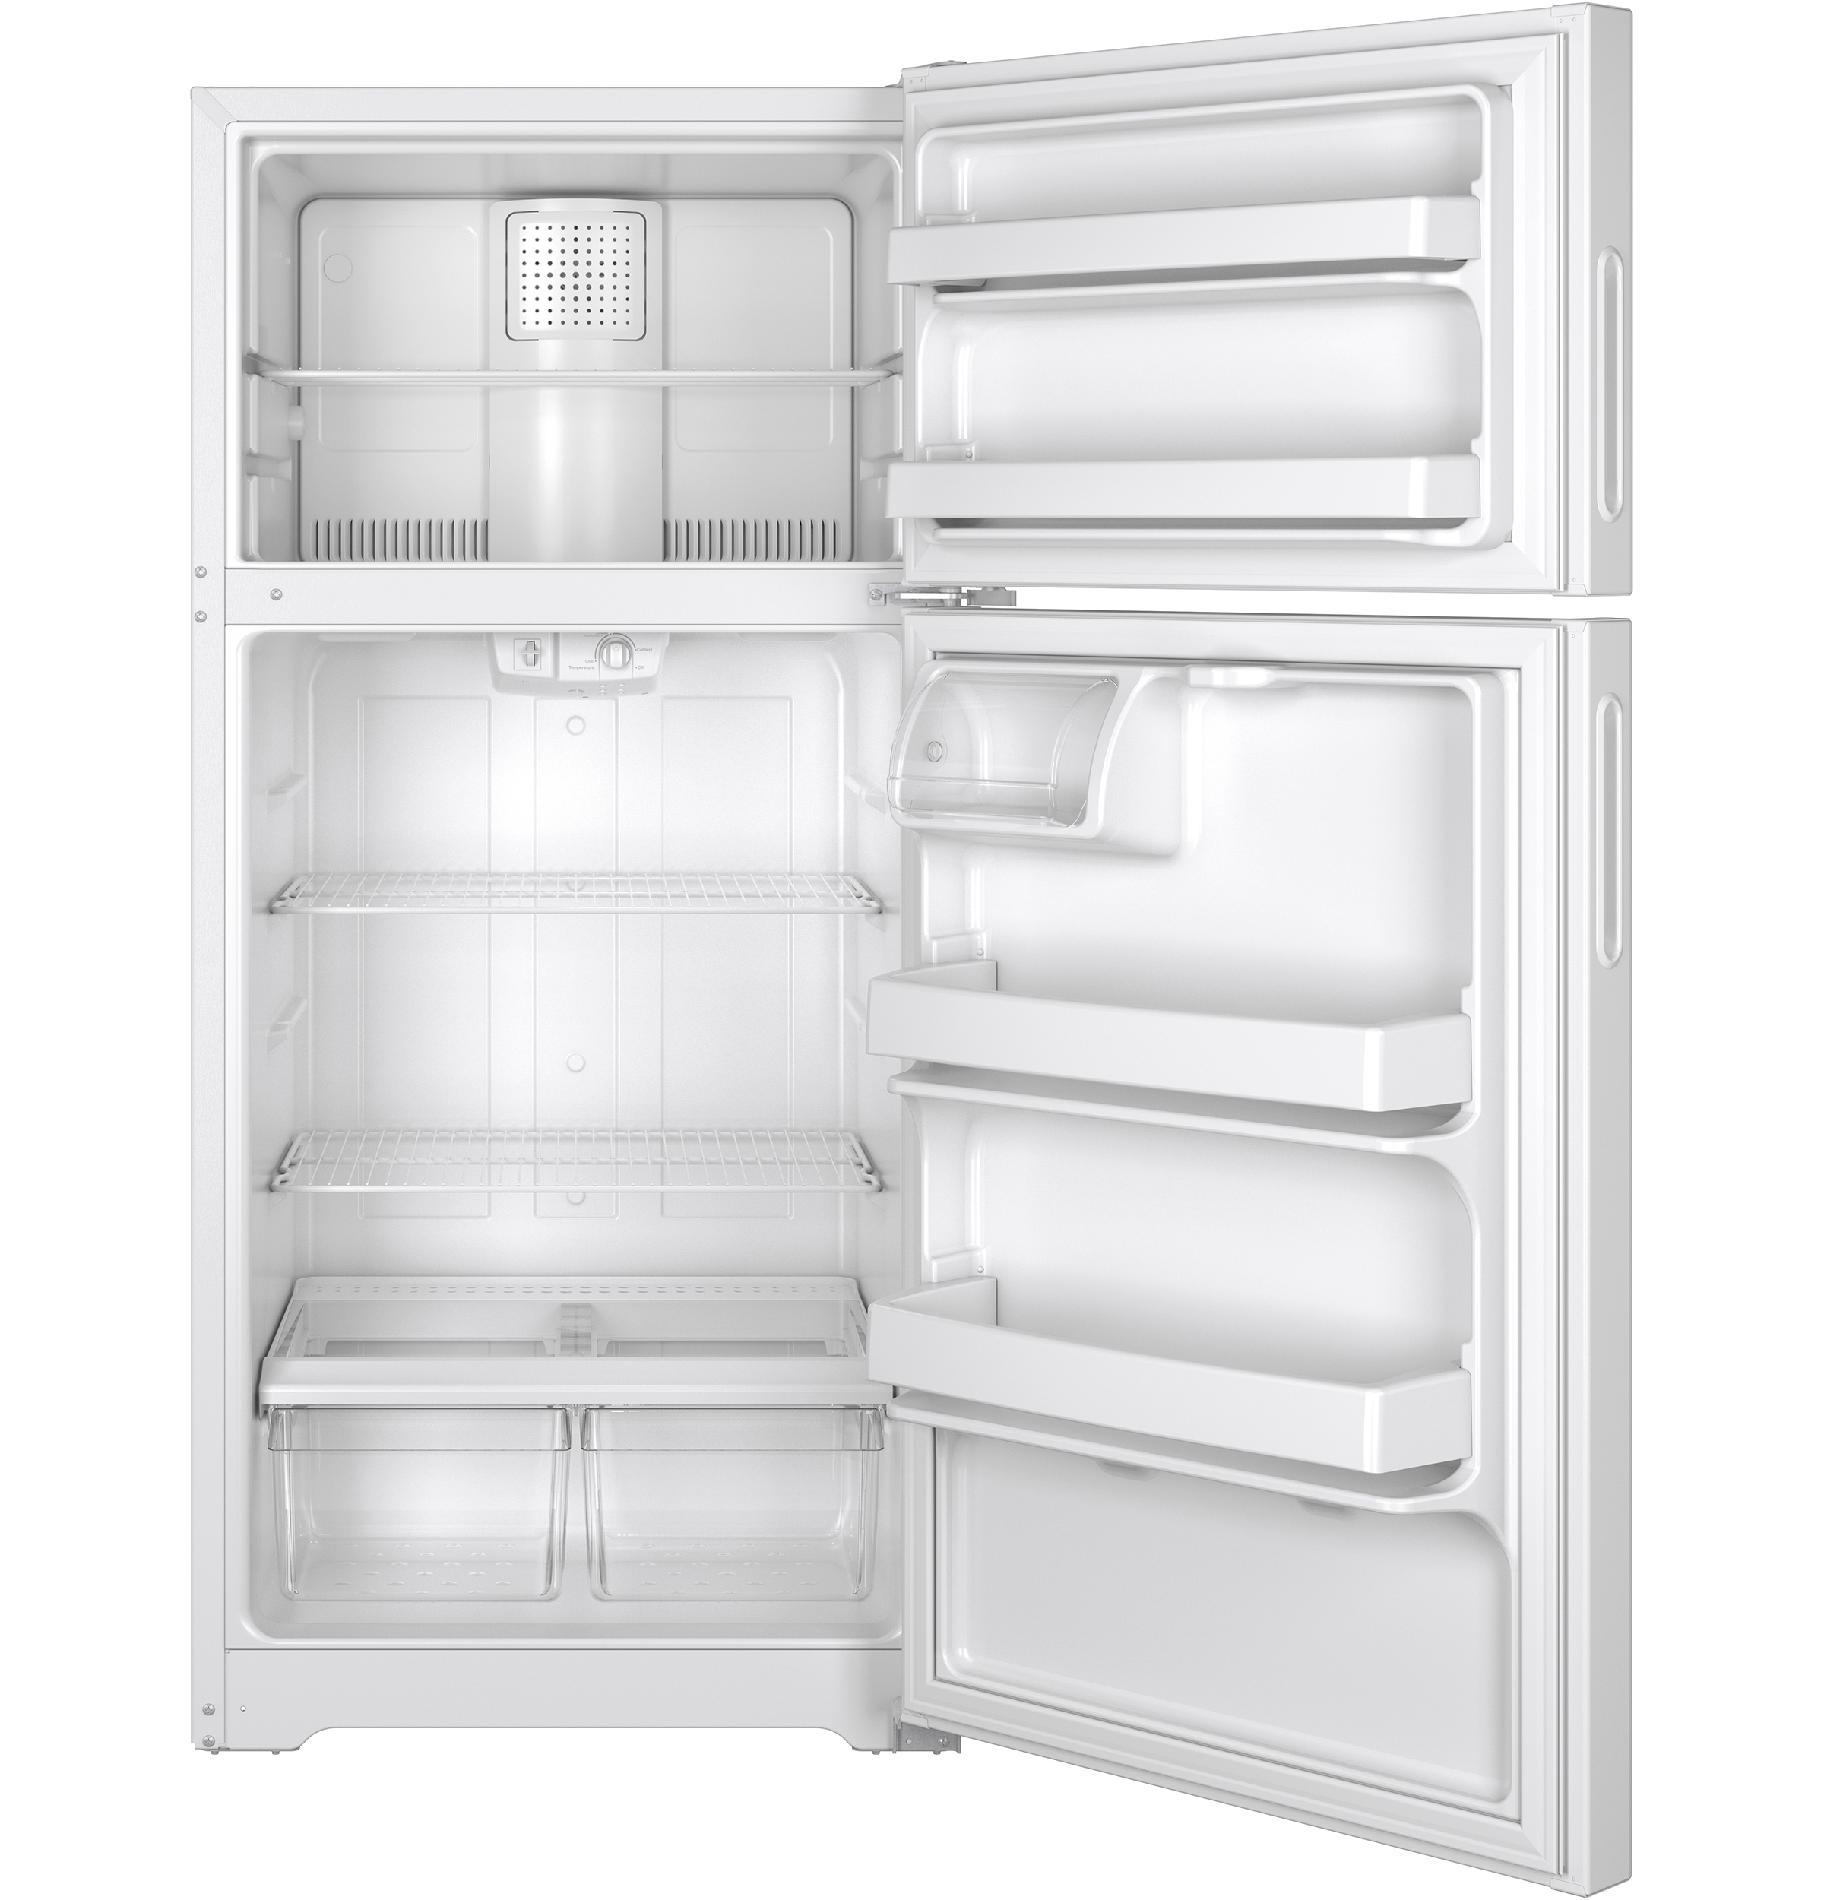 Hotpoint HPE15BTHWW 14.6 cu. ft. Recessed Handle Top-Freezer Refrigerator - White